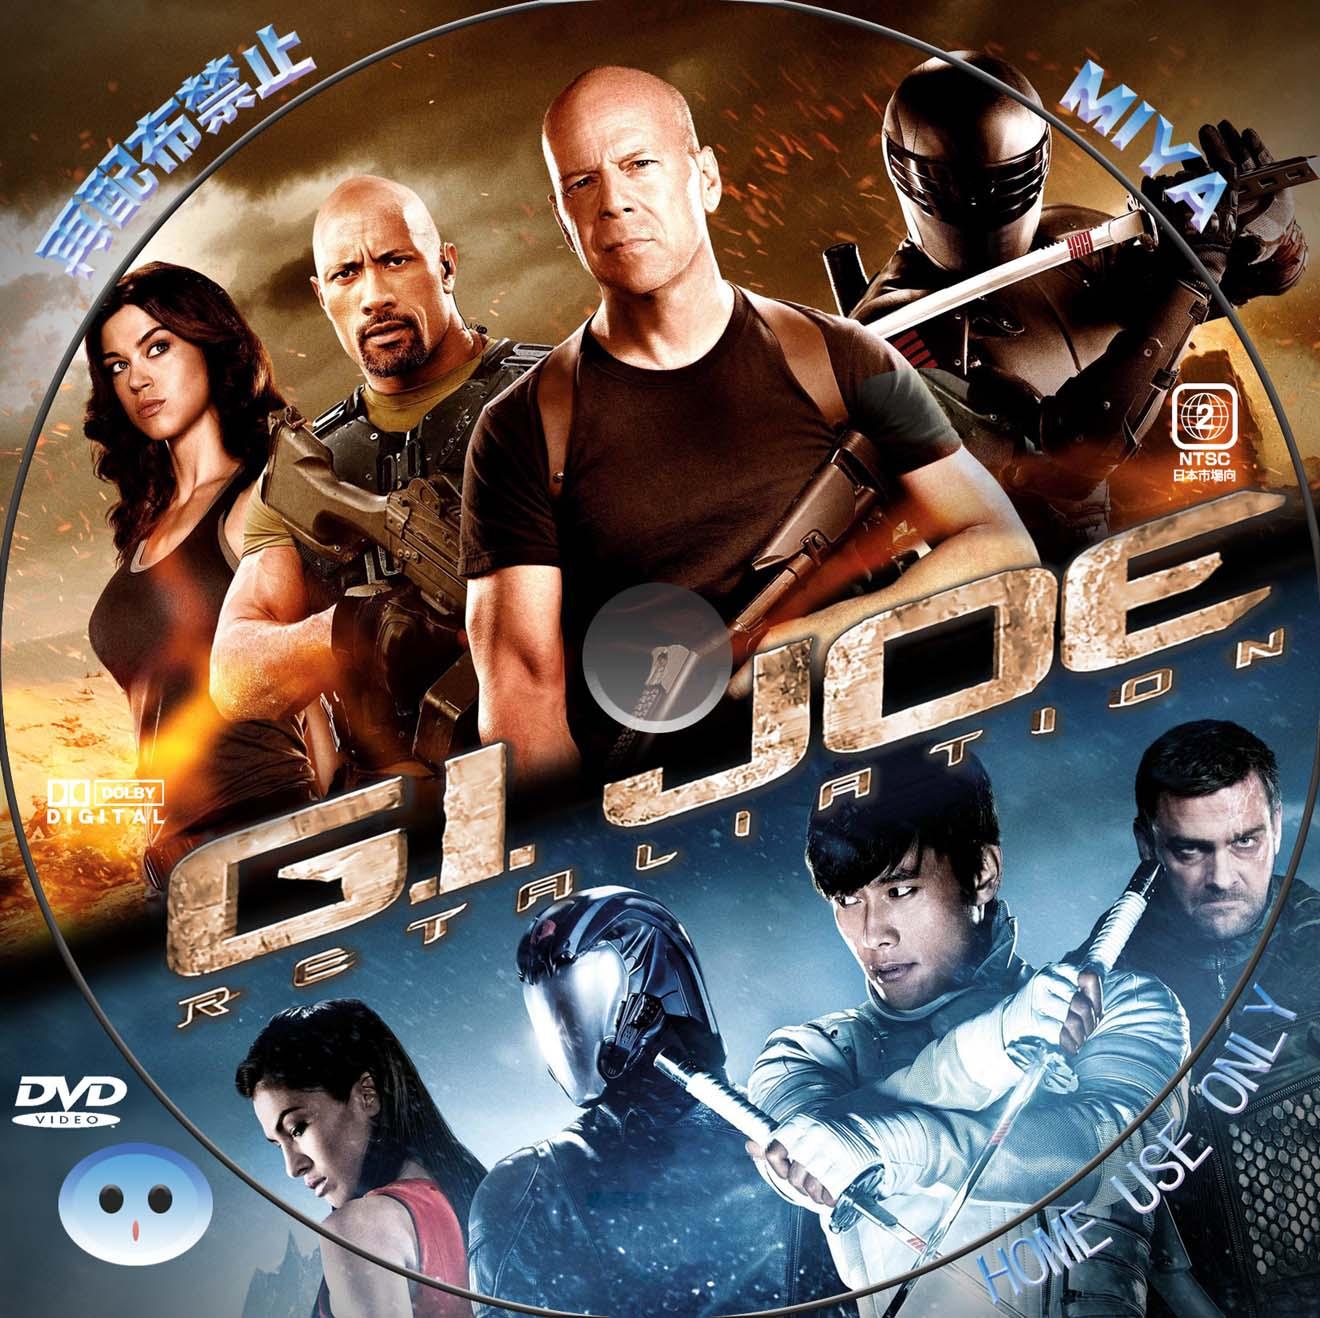 G.I. Joe- Retaliation